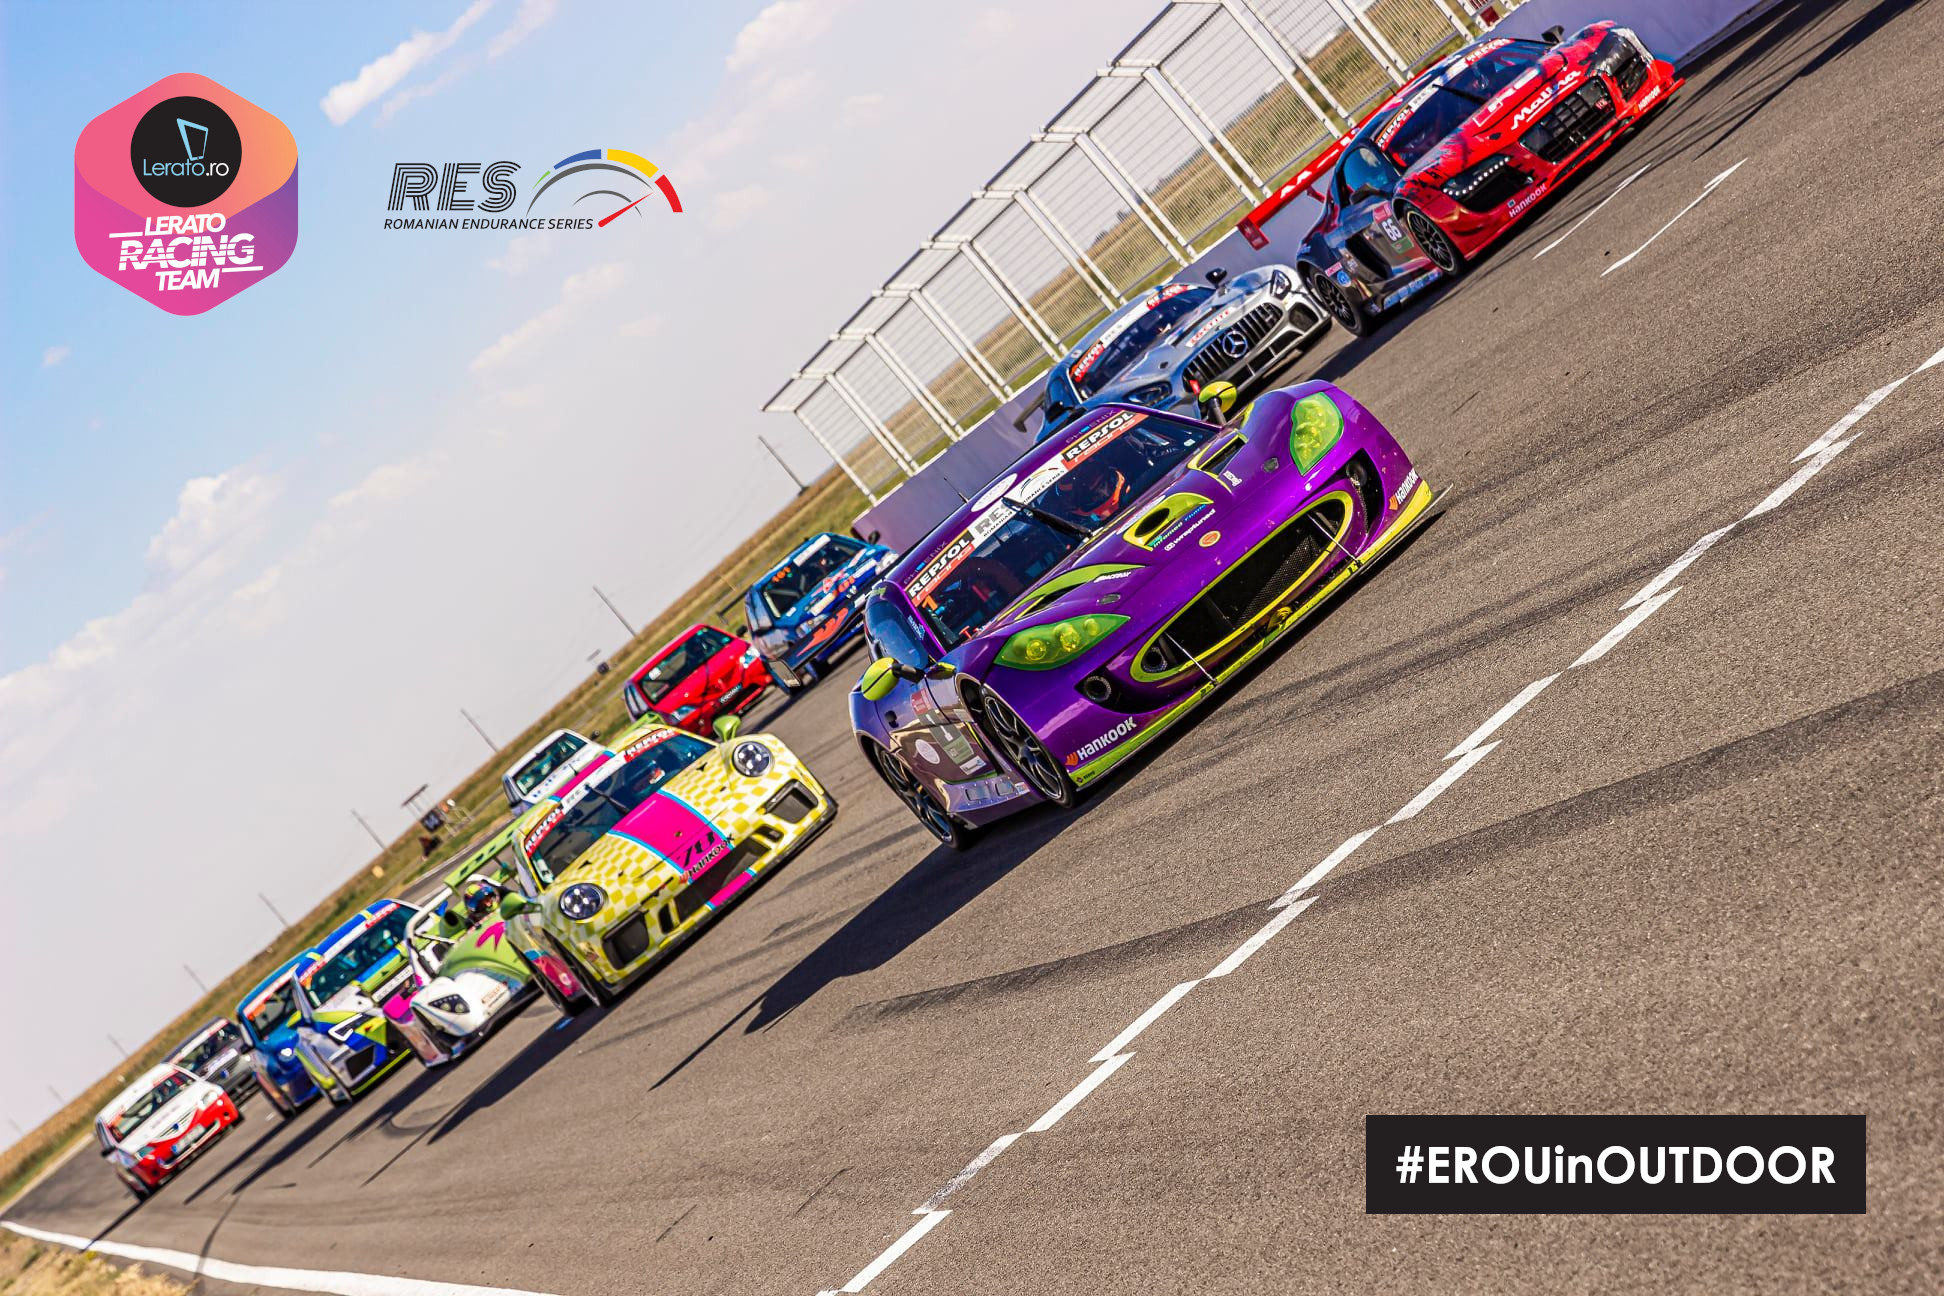 Lerato Racing Team RES 2021